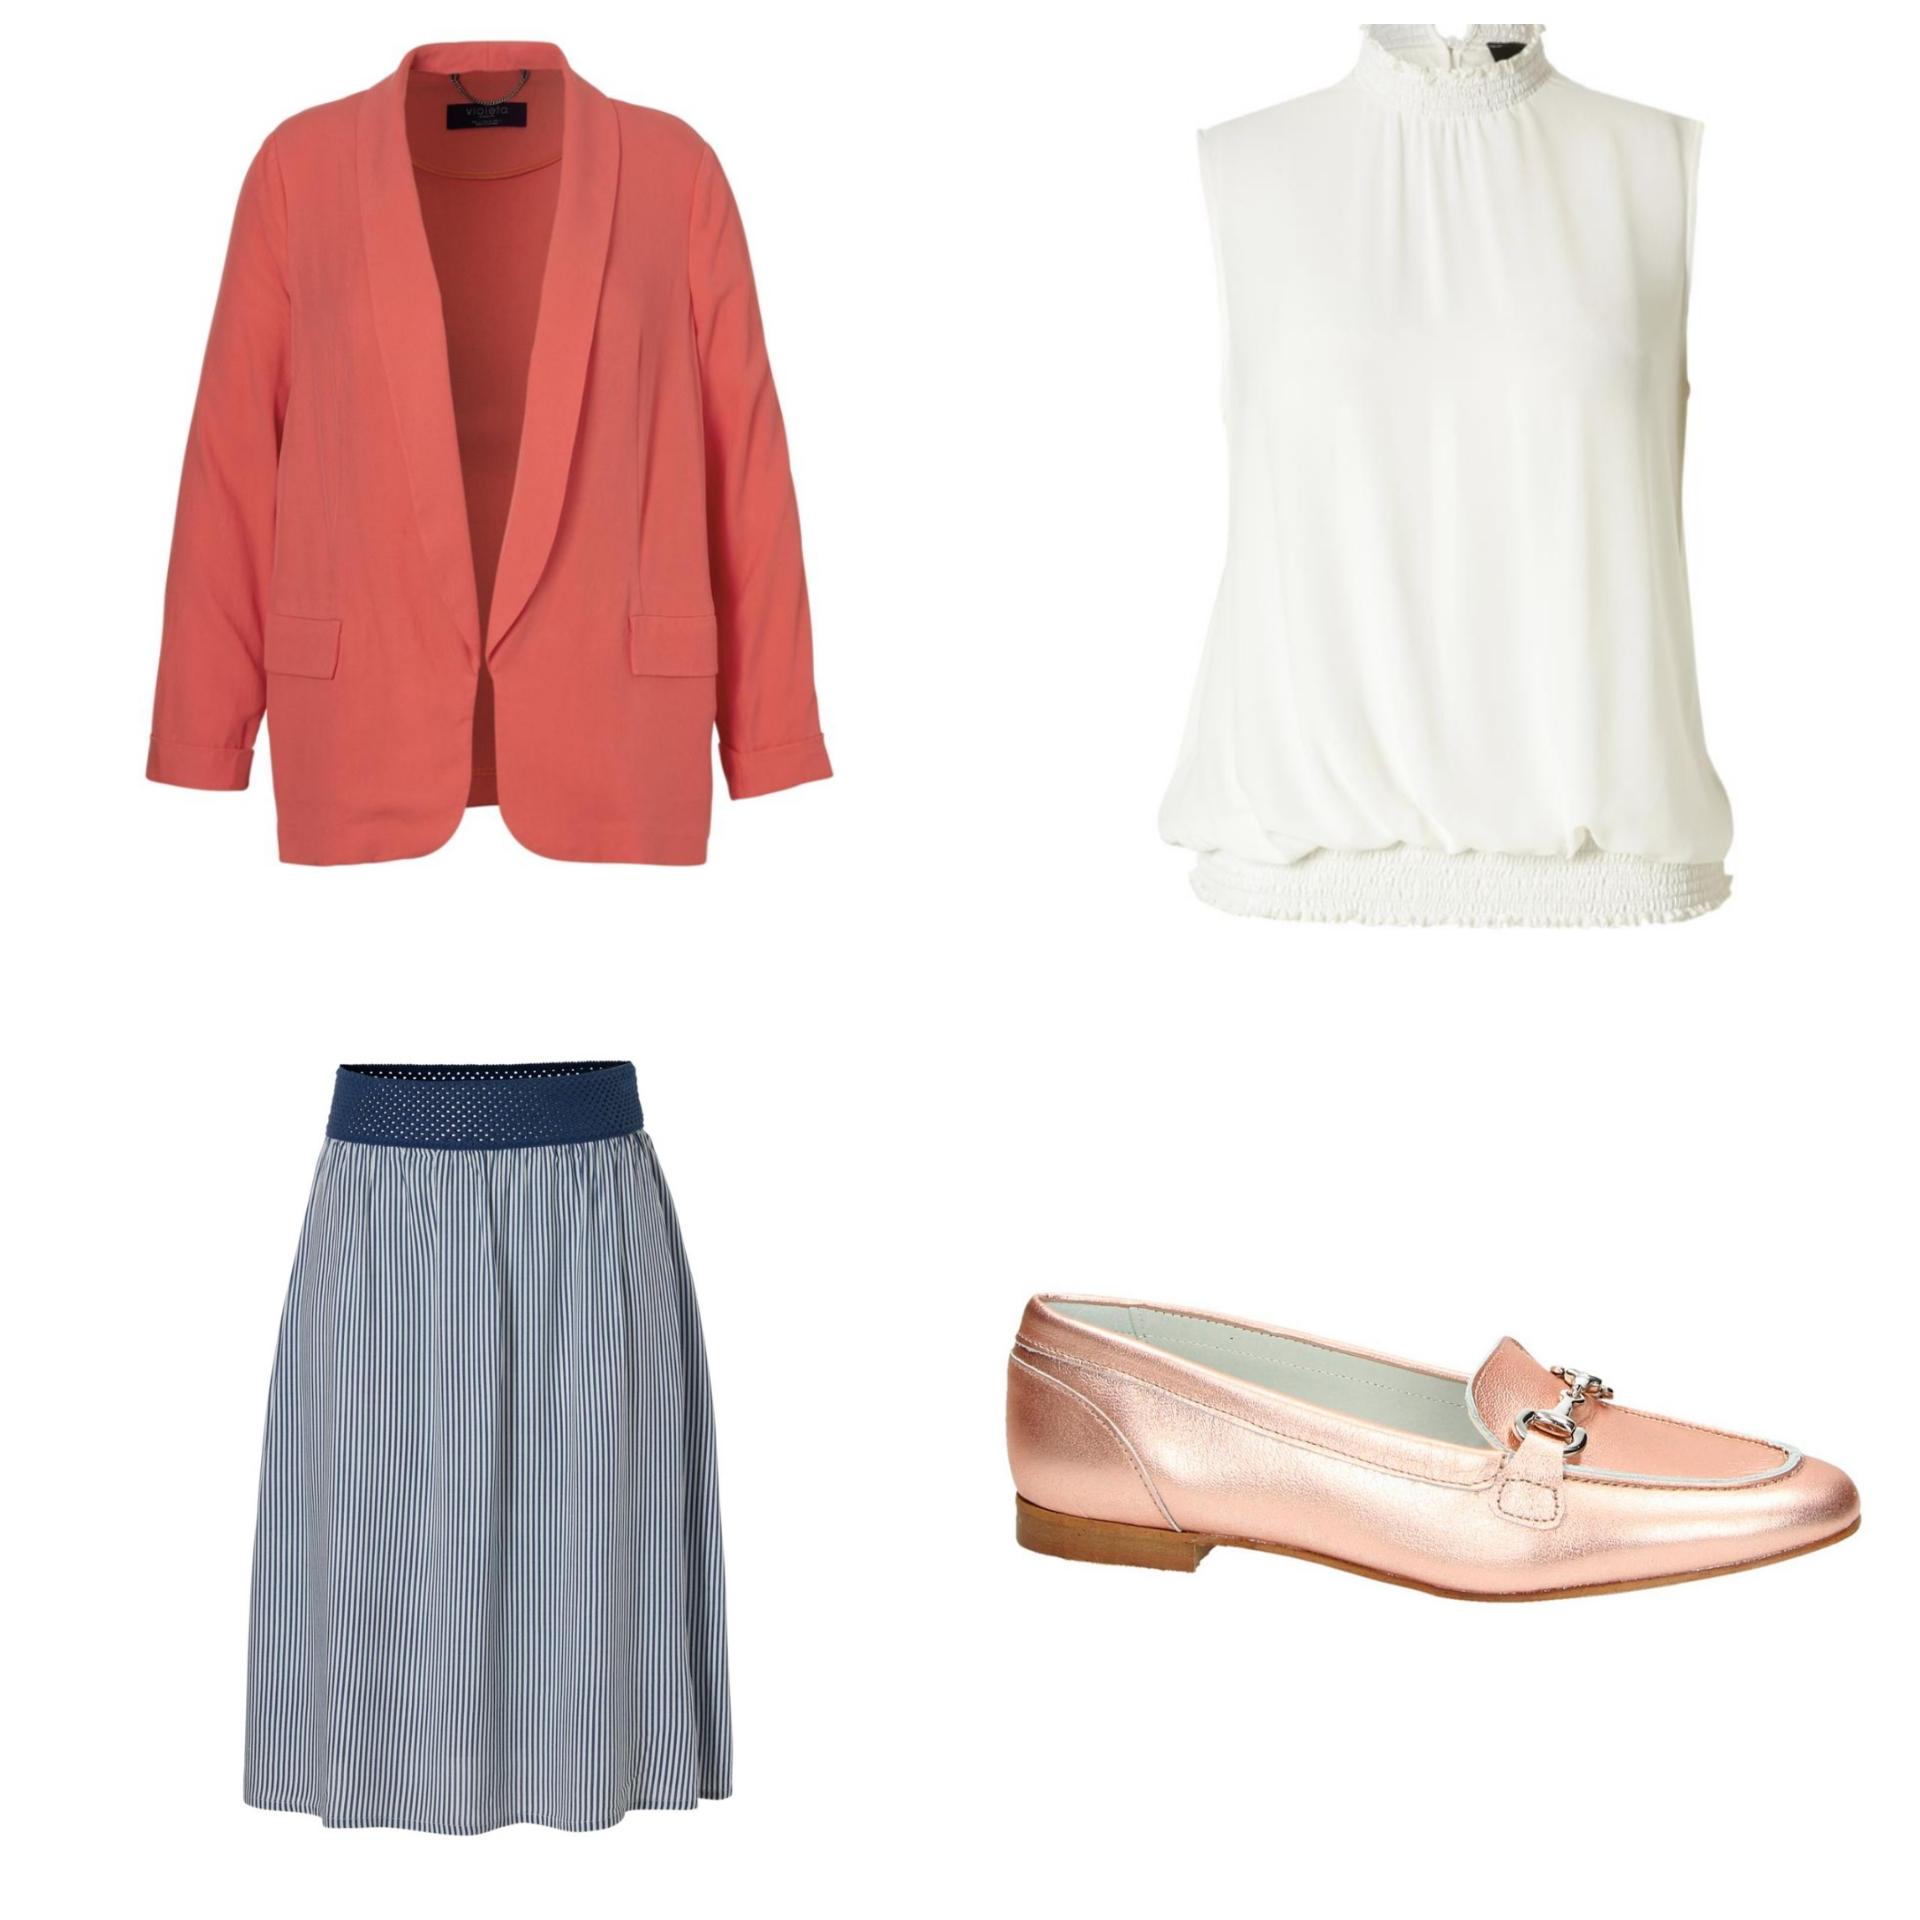 Plus Size Fashion Friday: Skirt alert